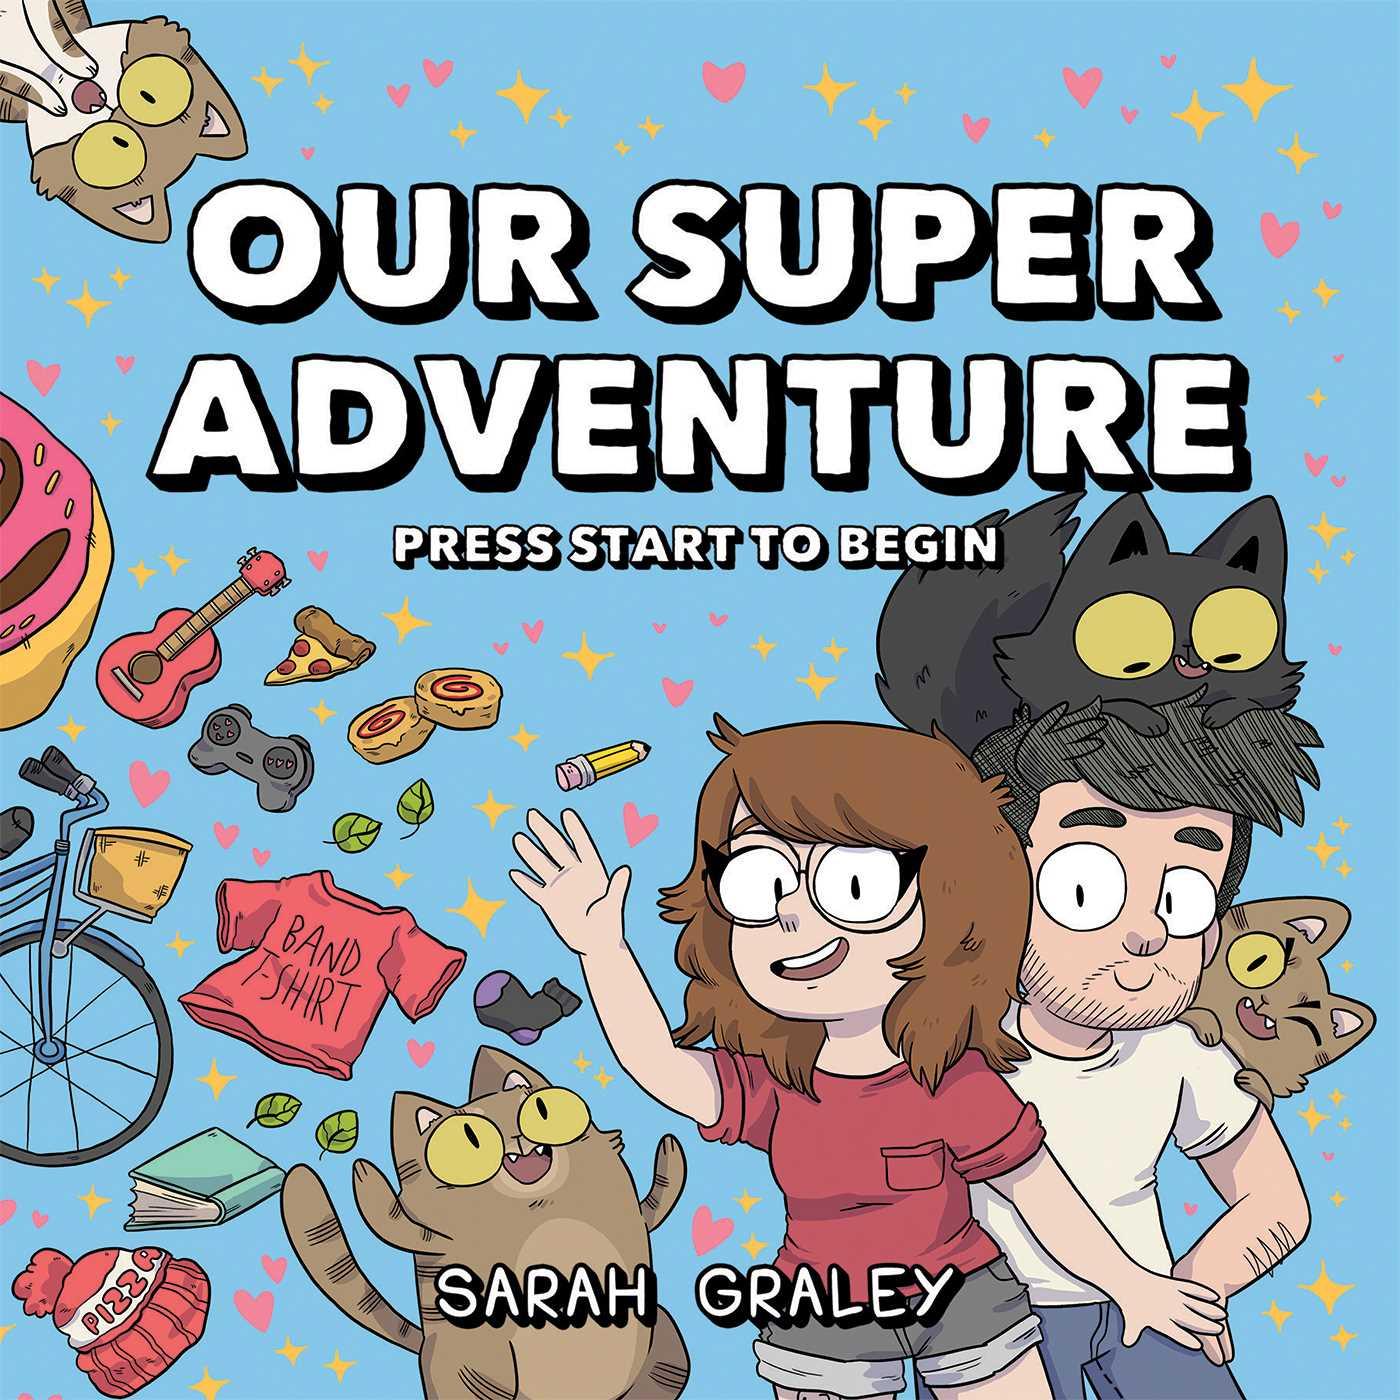 Our super adventure 9781620105825 hr